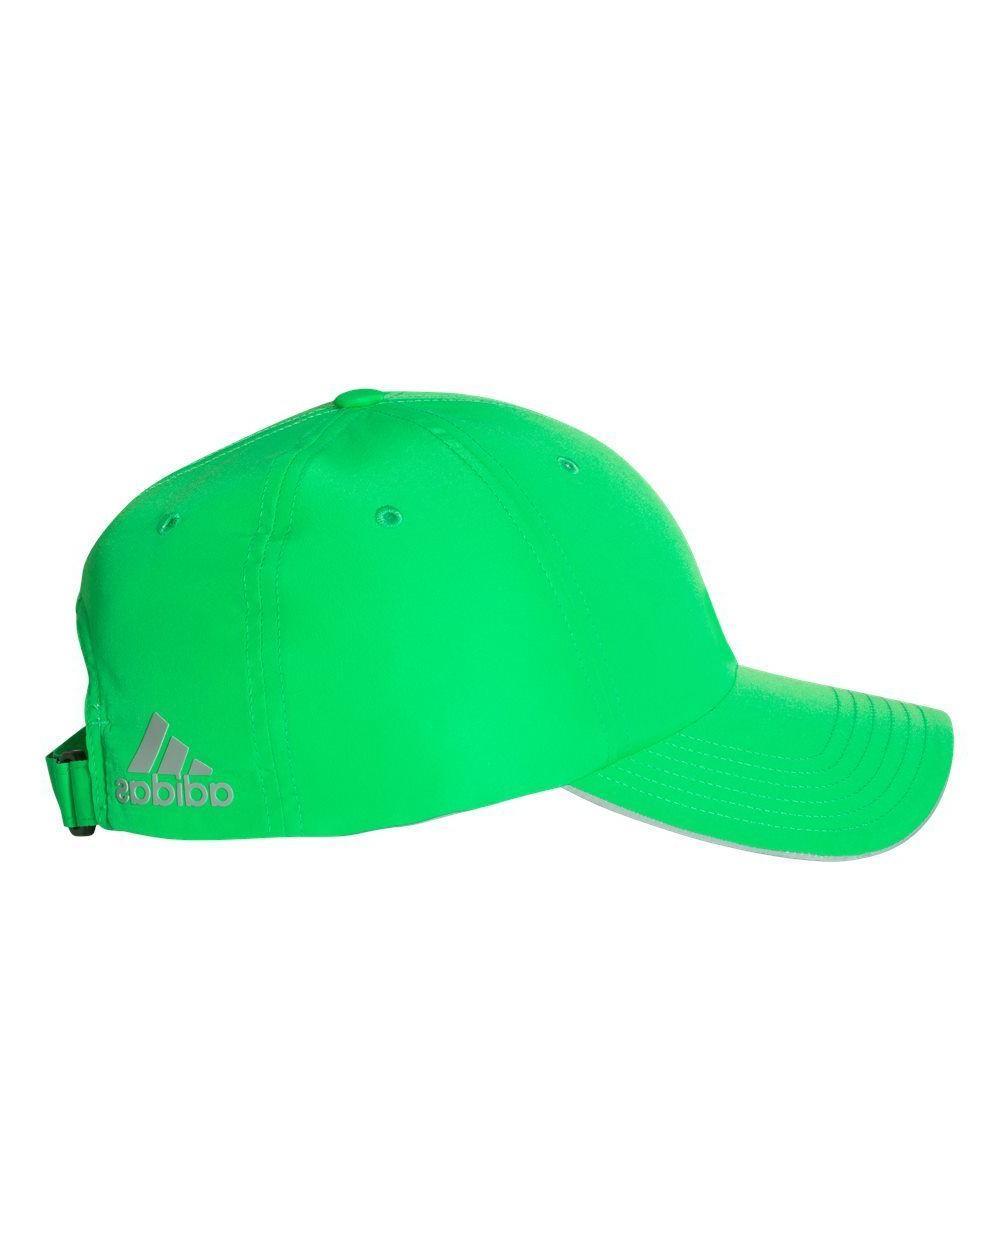 ADIDAS Adjustable HAT, NEW Men's Performance